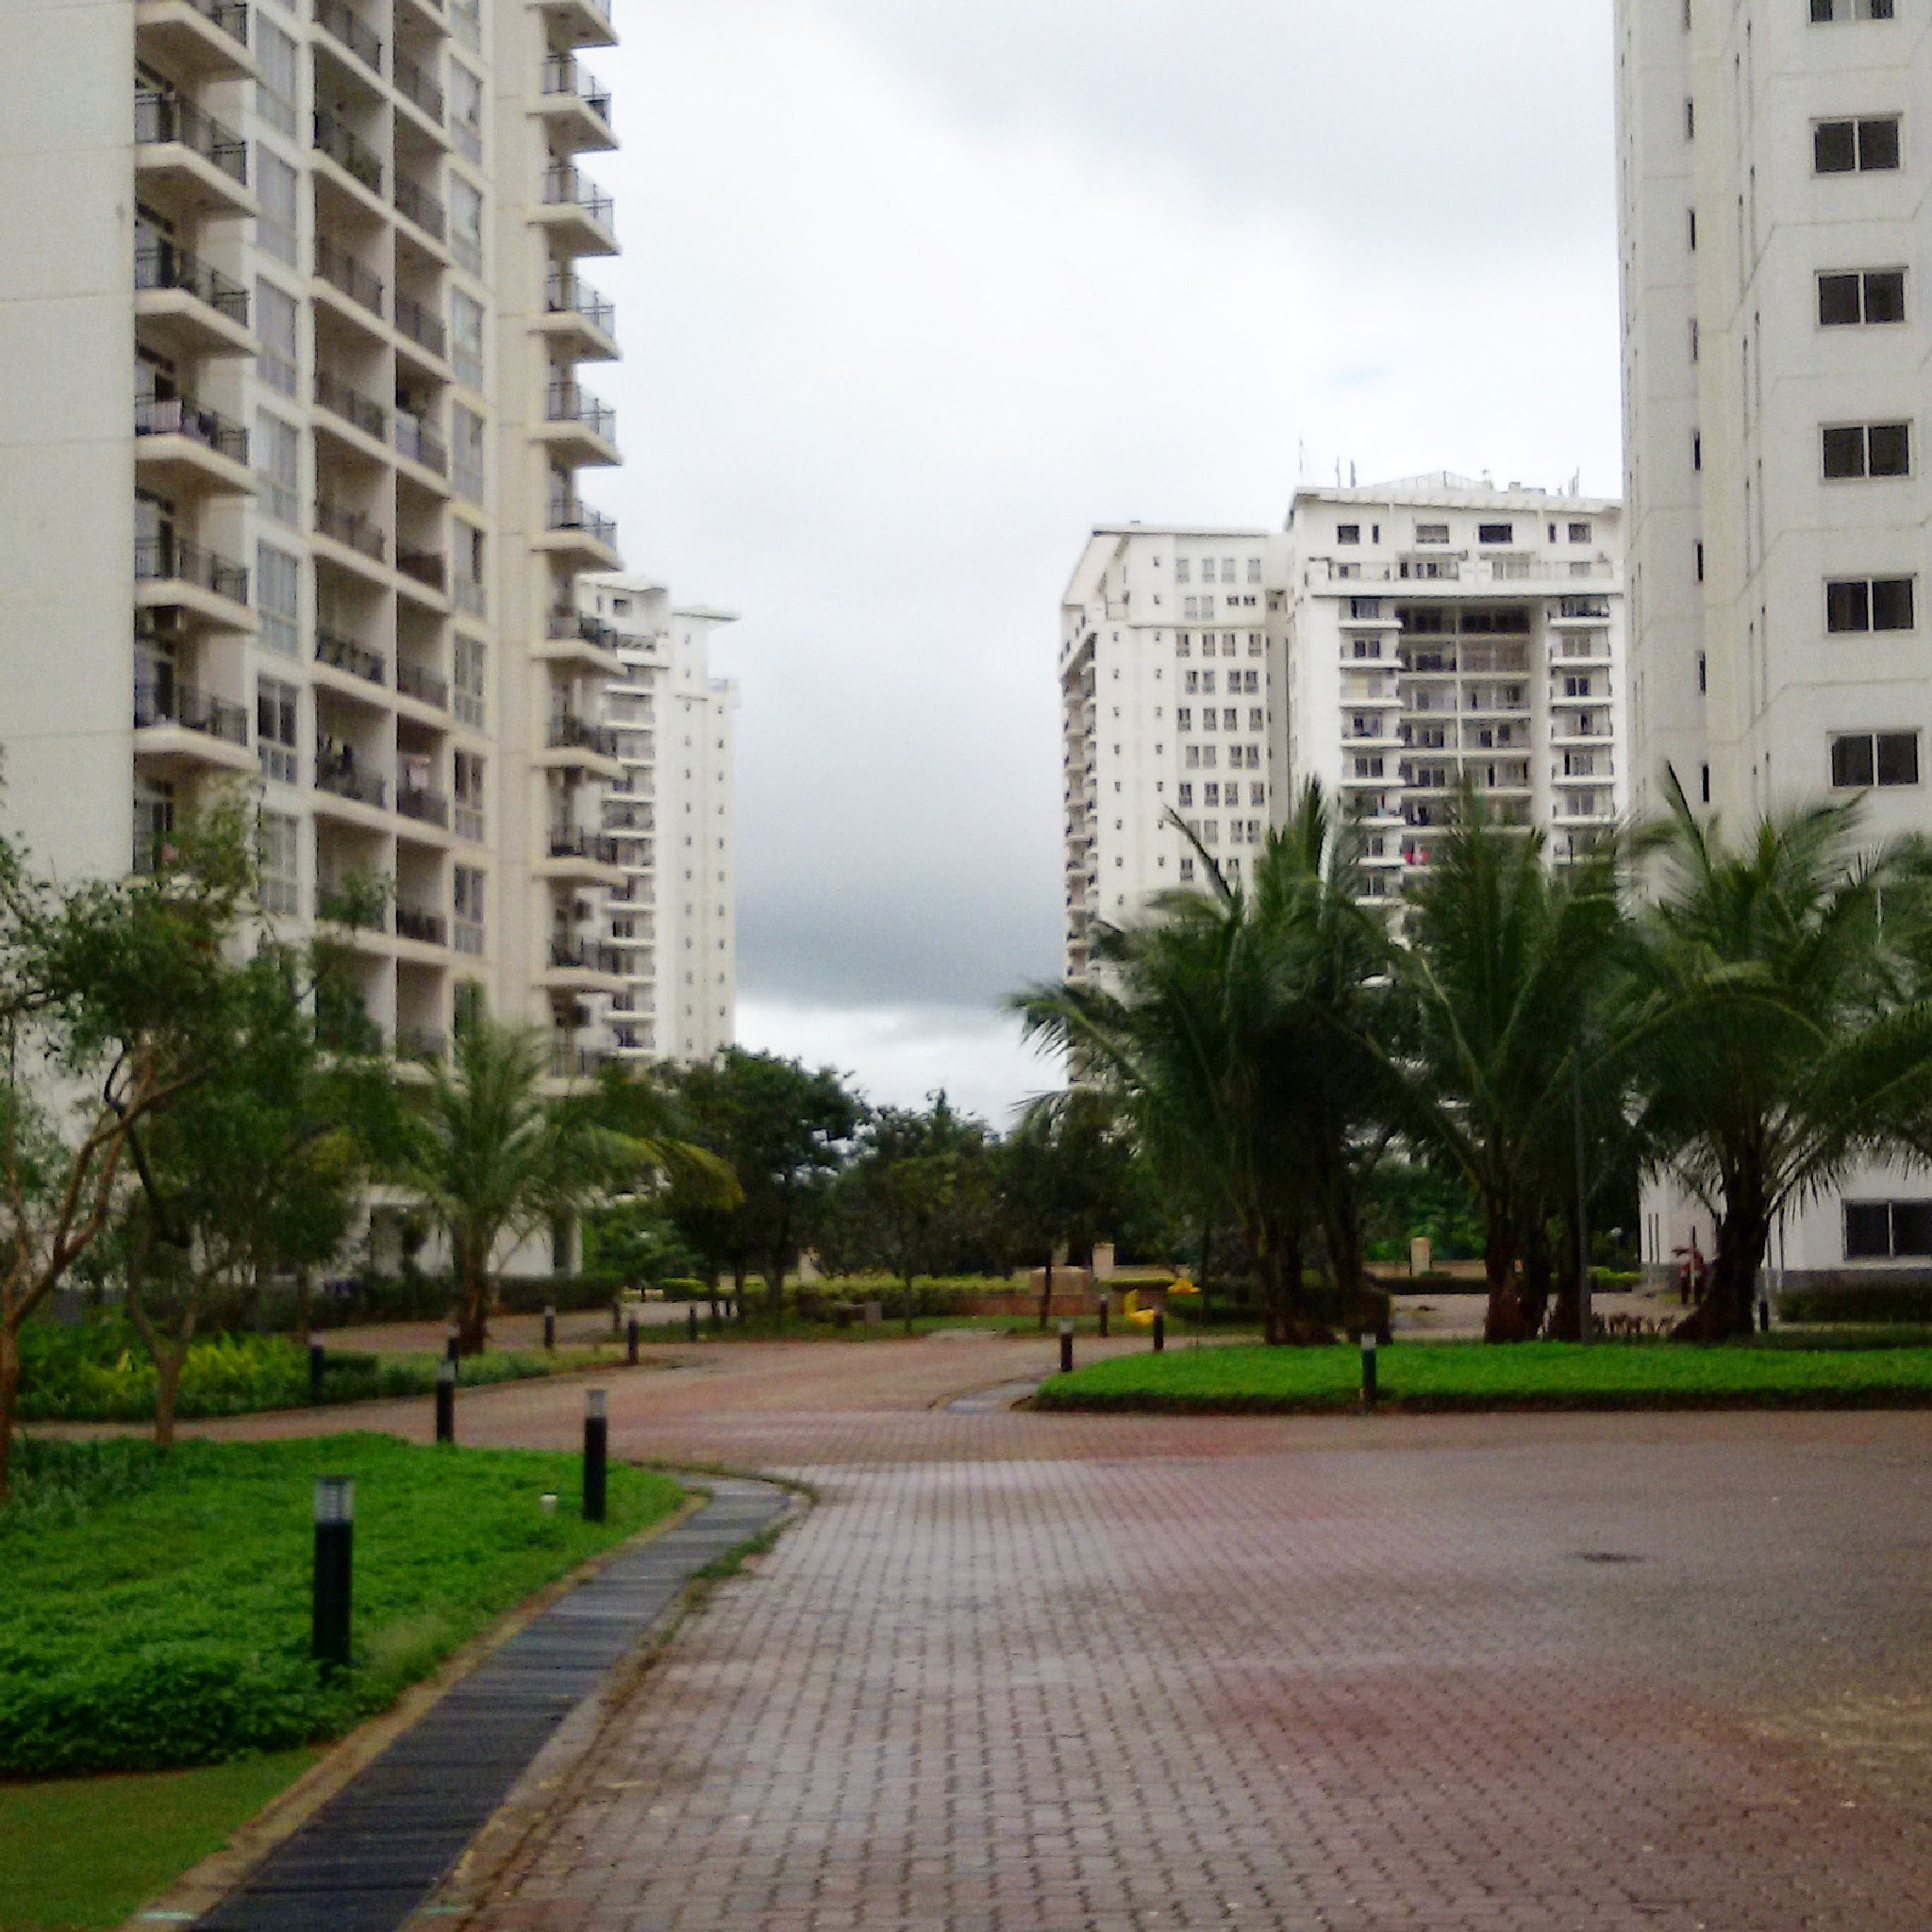 Architecture  by Radhamadhavan K S